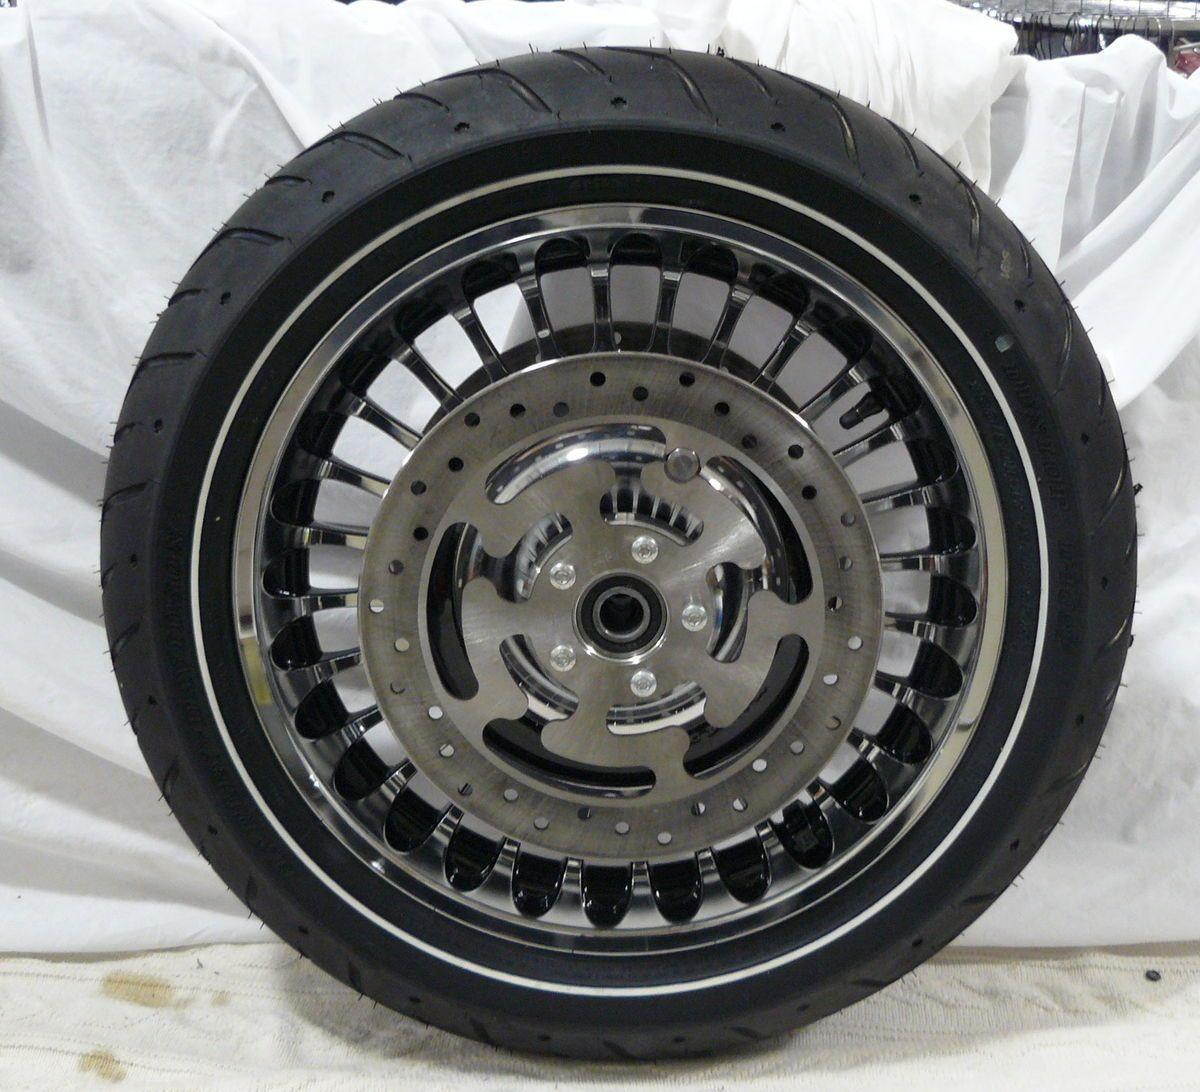 Harley Davidson Touring 28 Spoke Chrome Wheels Tires Stock Take Offs